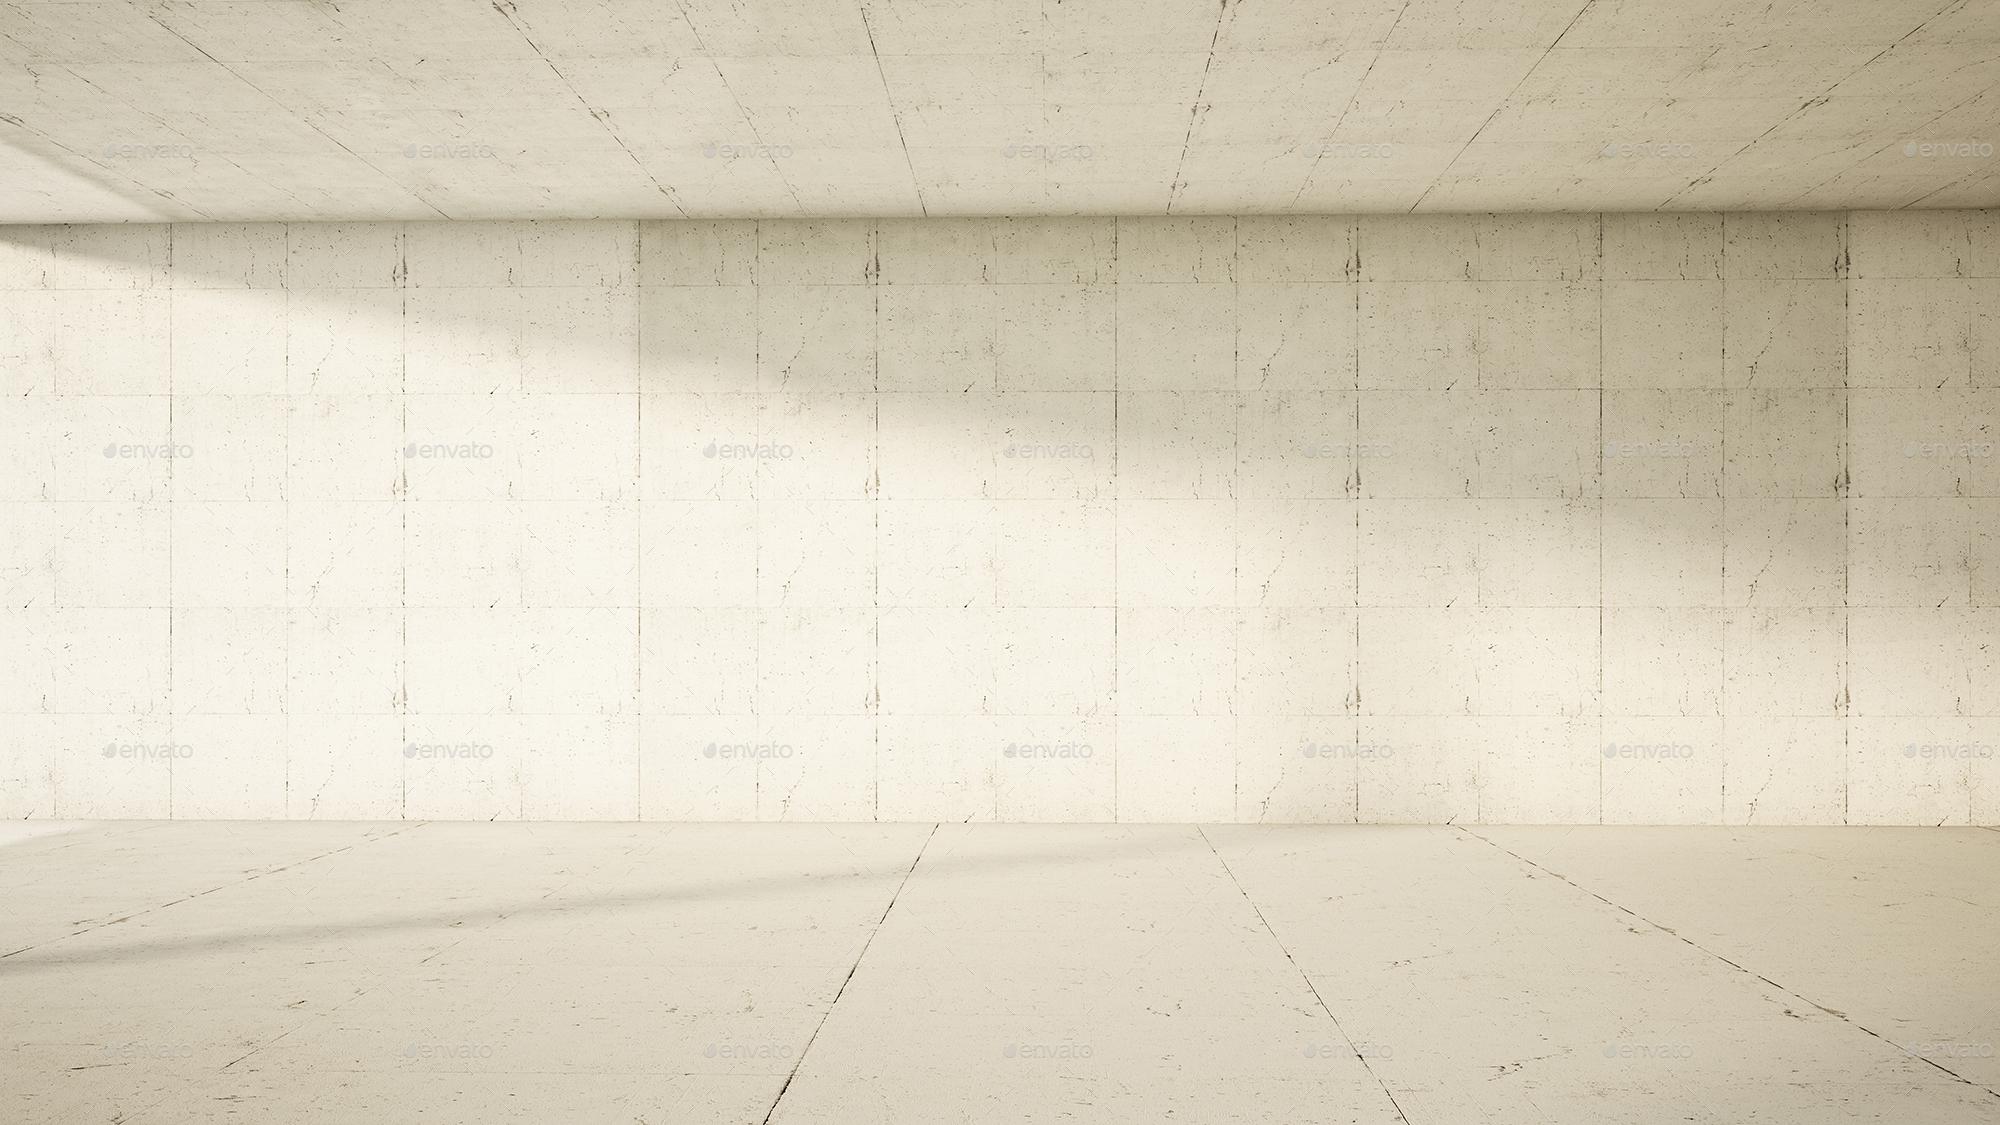 empty interior frontal concrete 3d illustration preview image setempty interior frontal concrete 3d illustration 1jpg